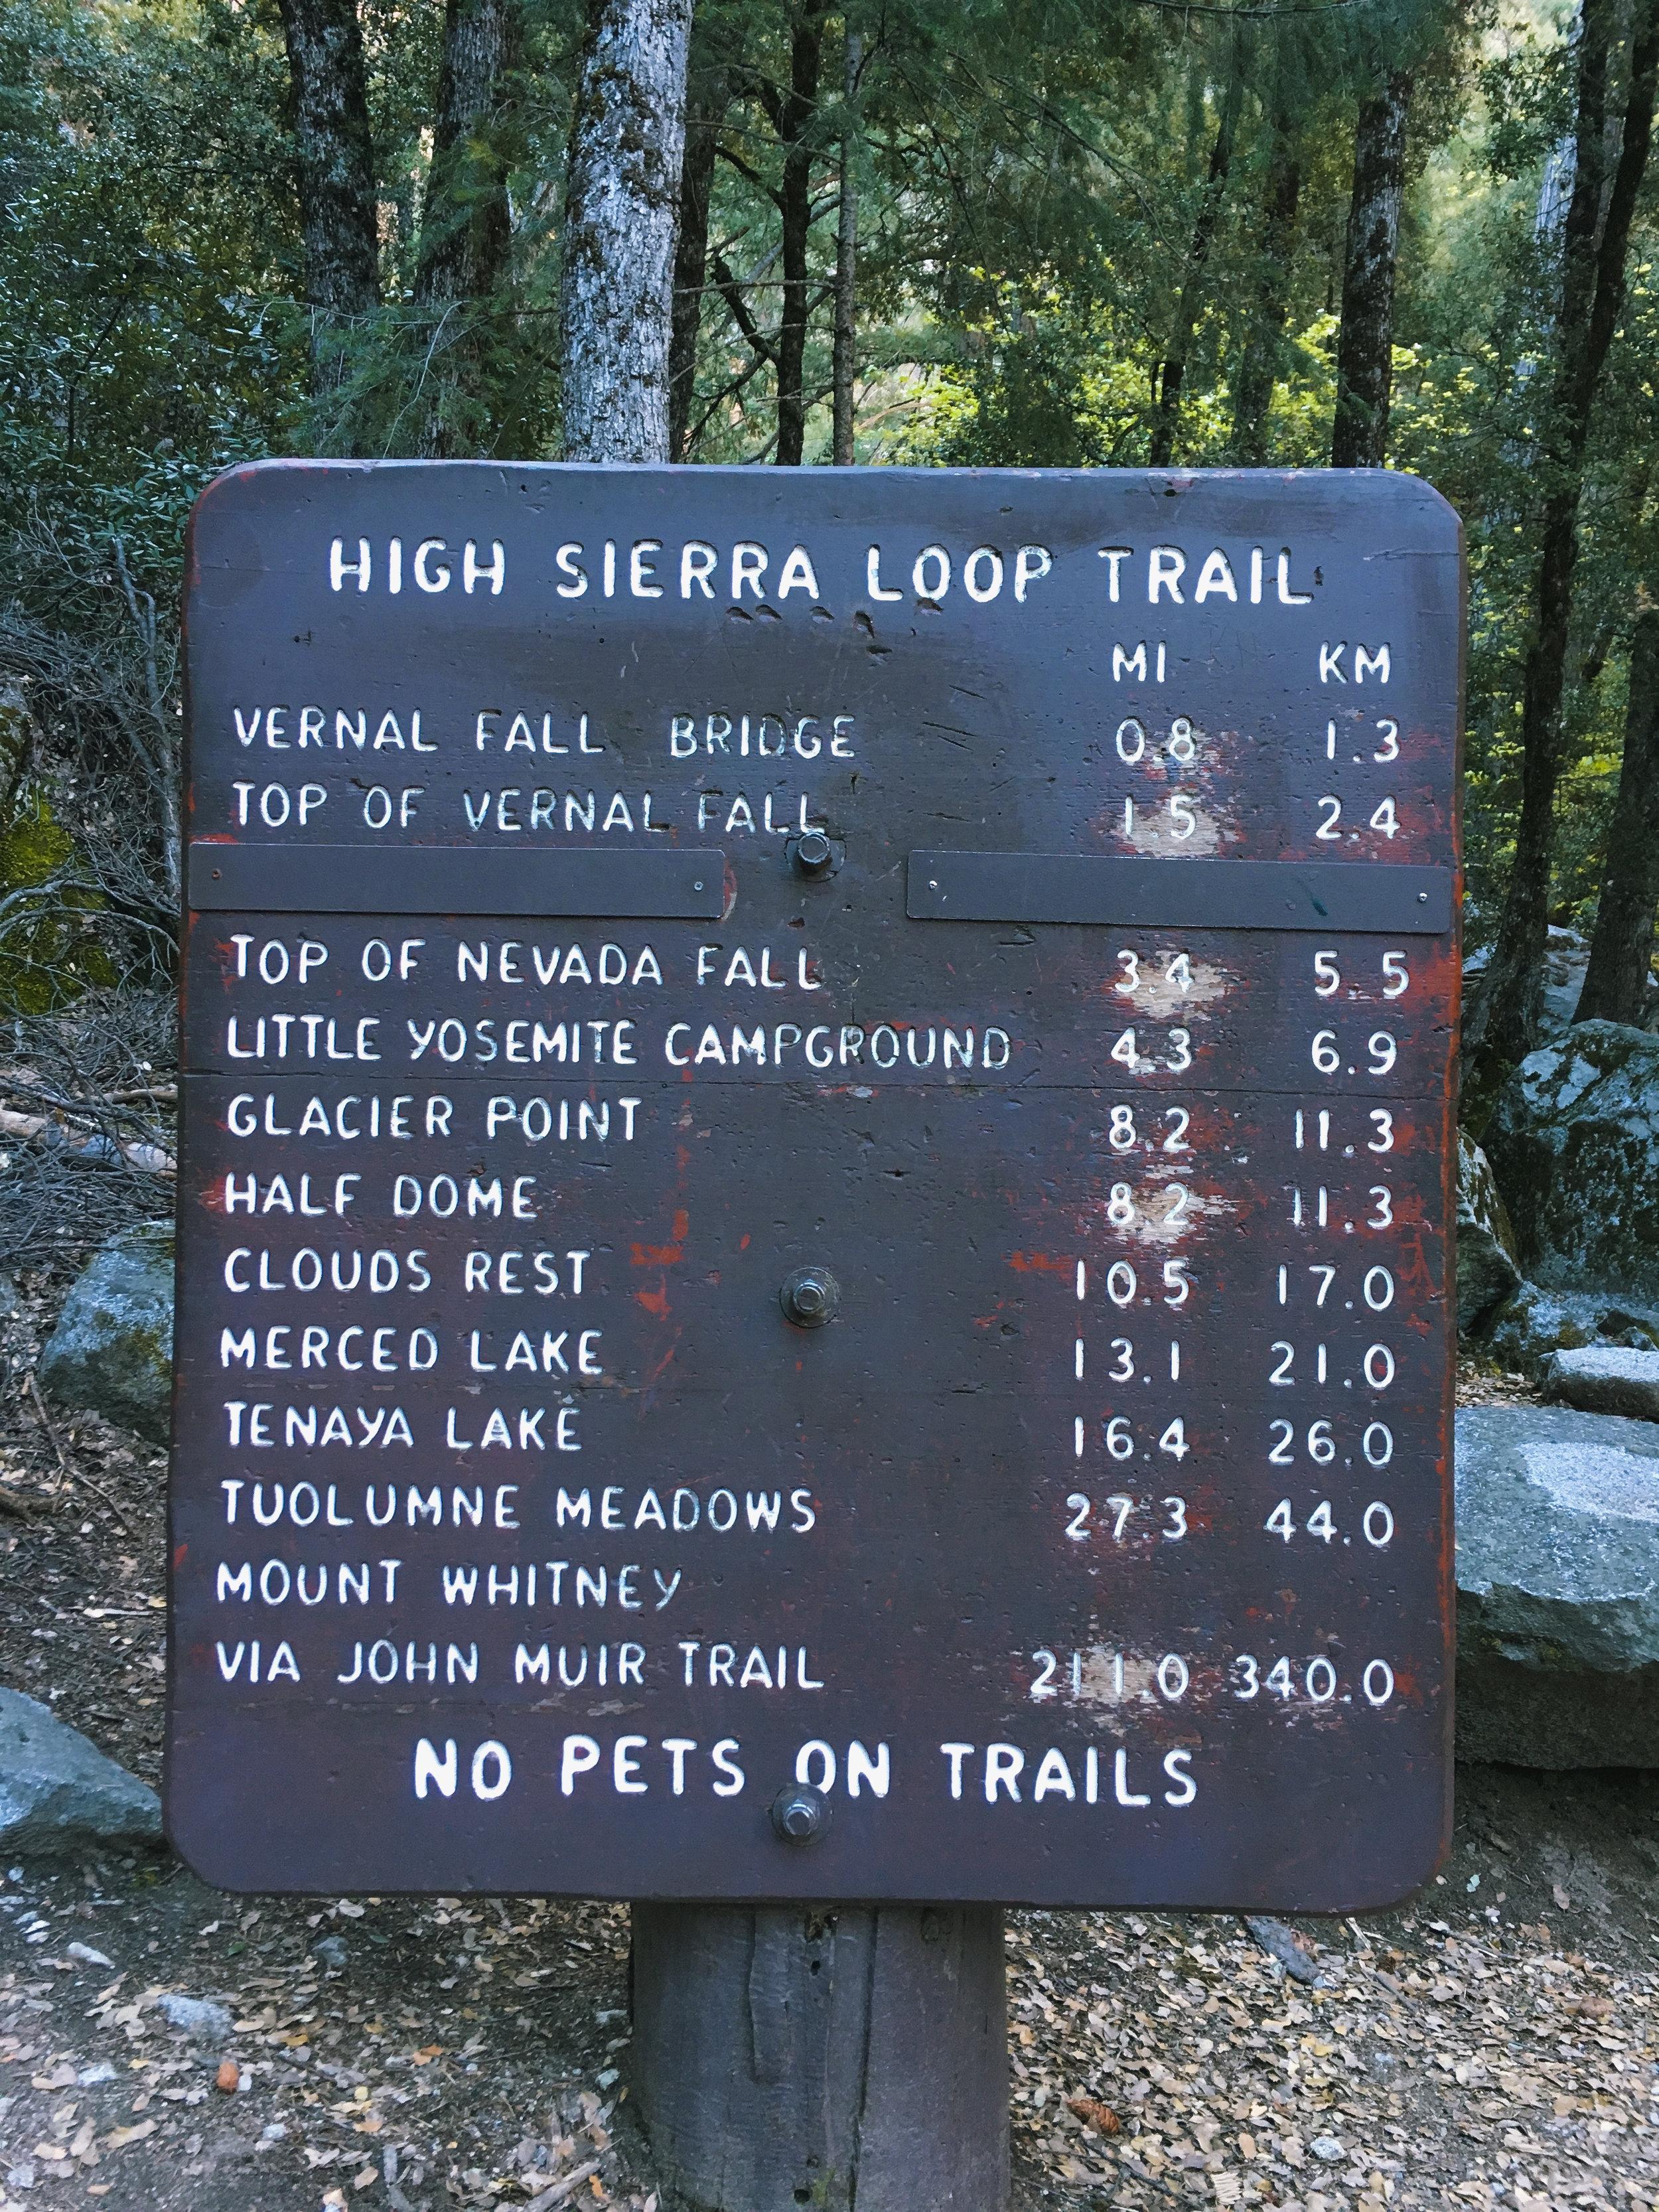 The John Muir Trail Northern Terminus